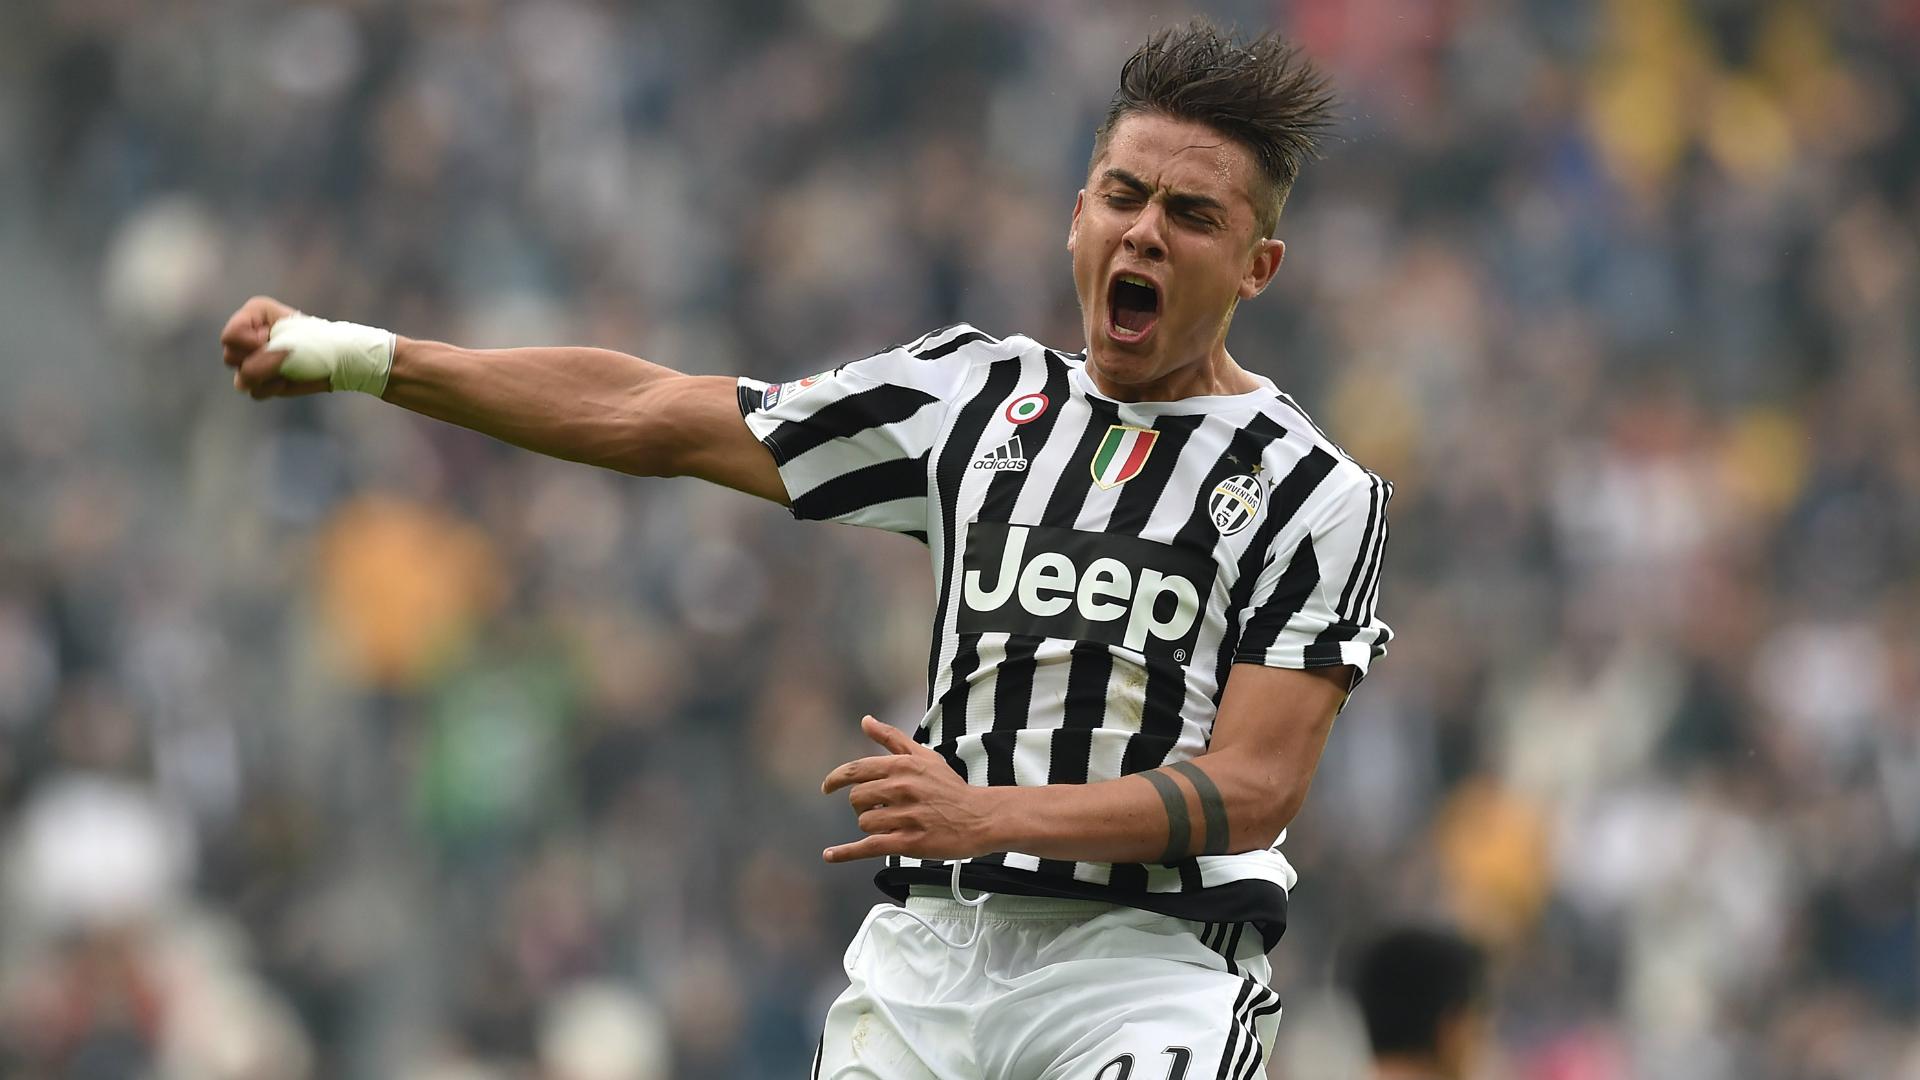 Juventus 2 0 Atalanta Dybala Shines In Routine Win